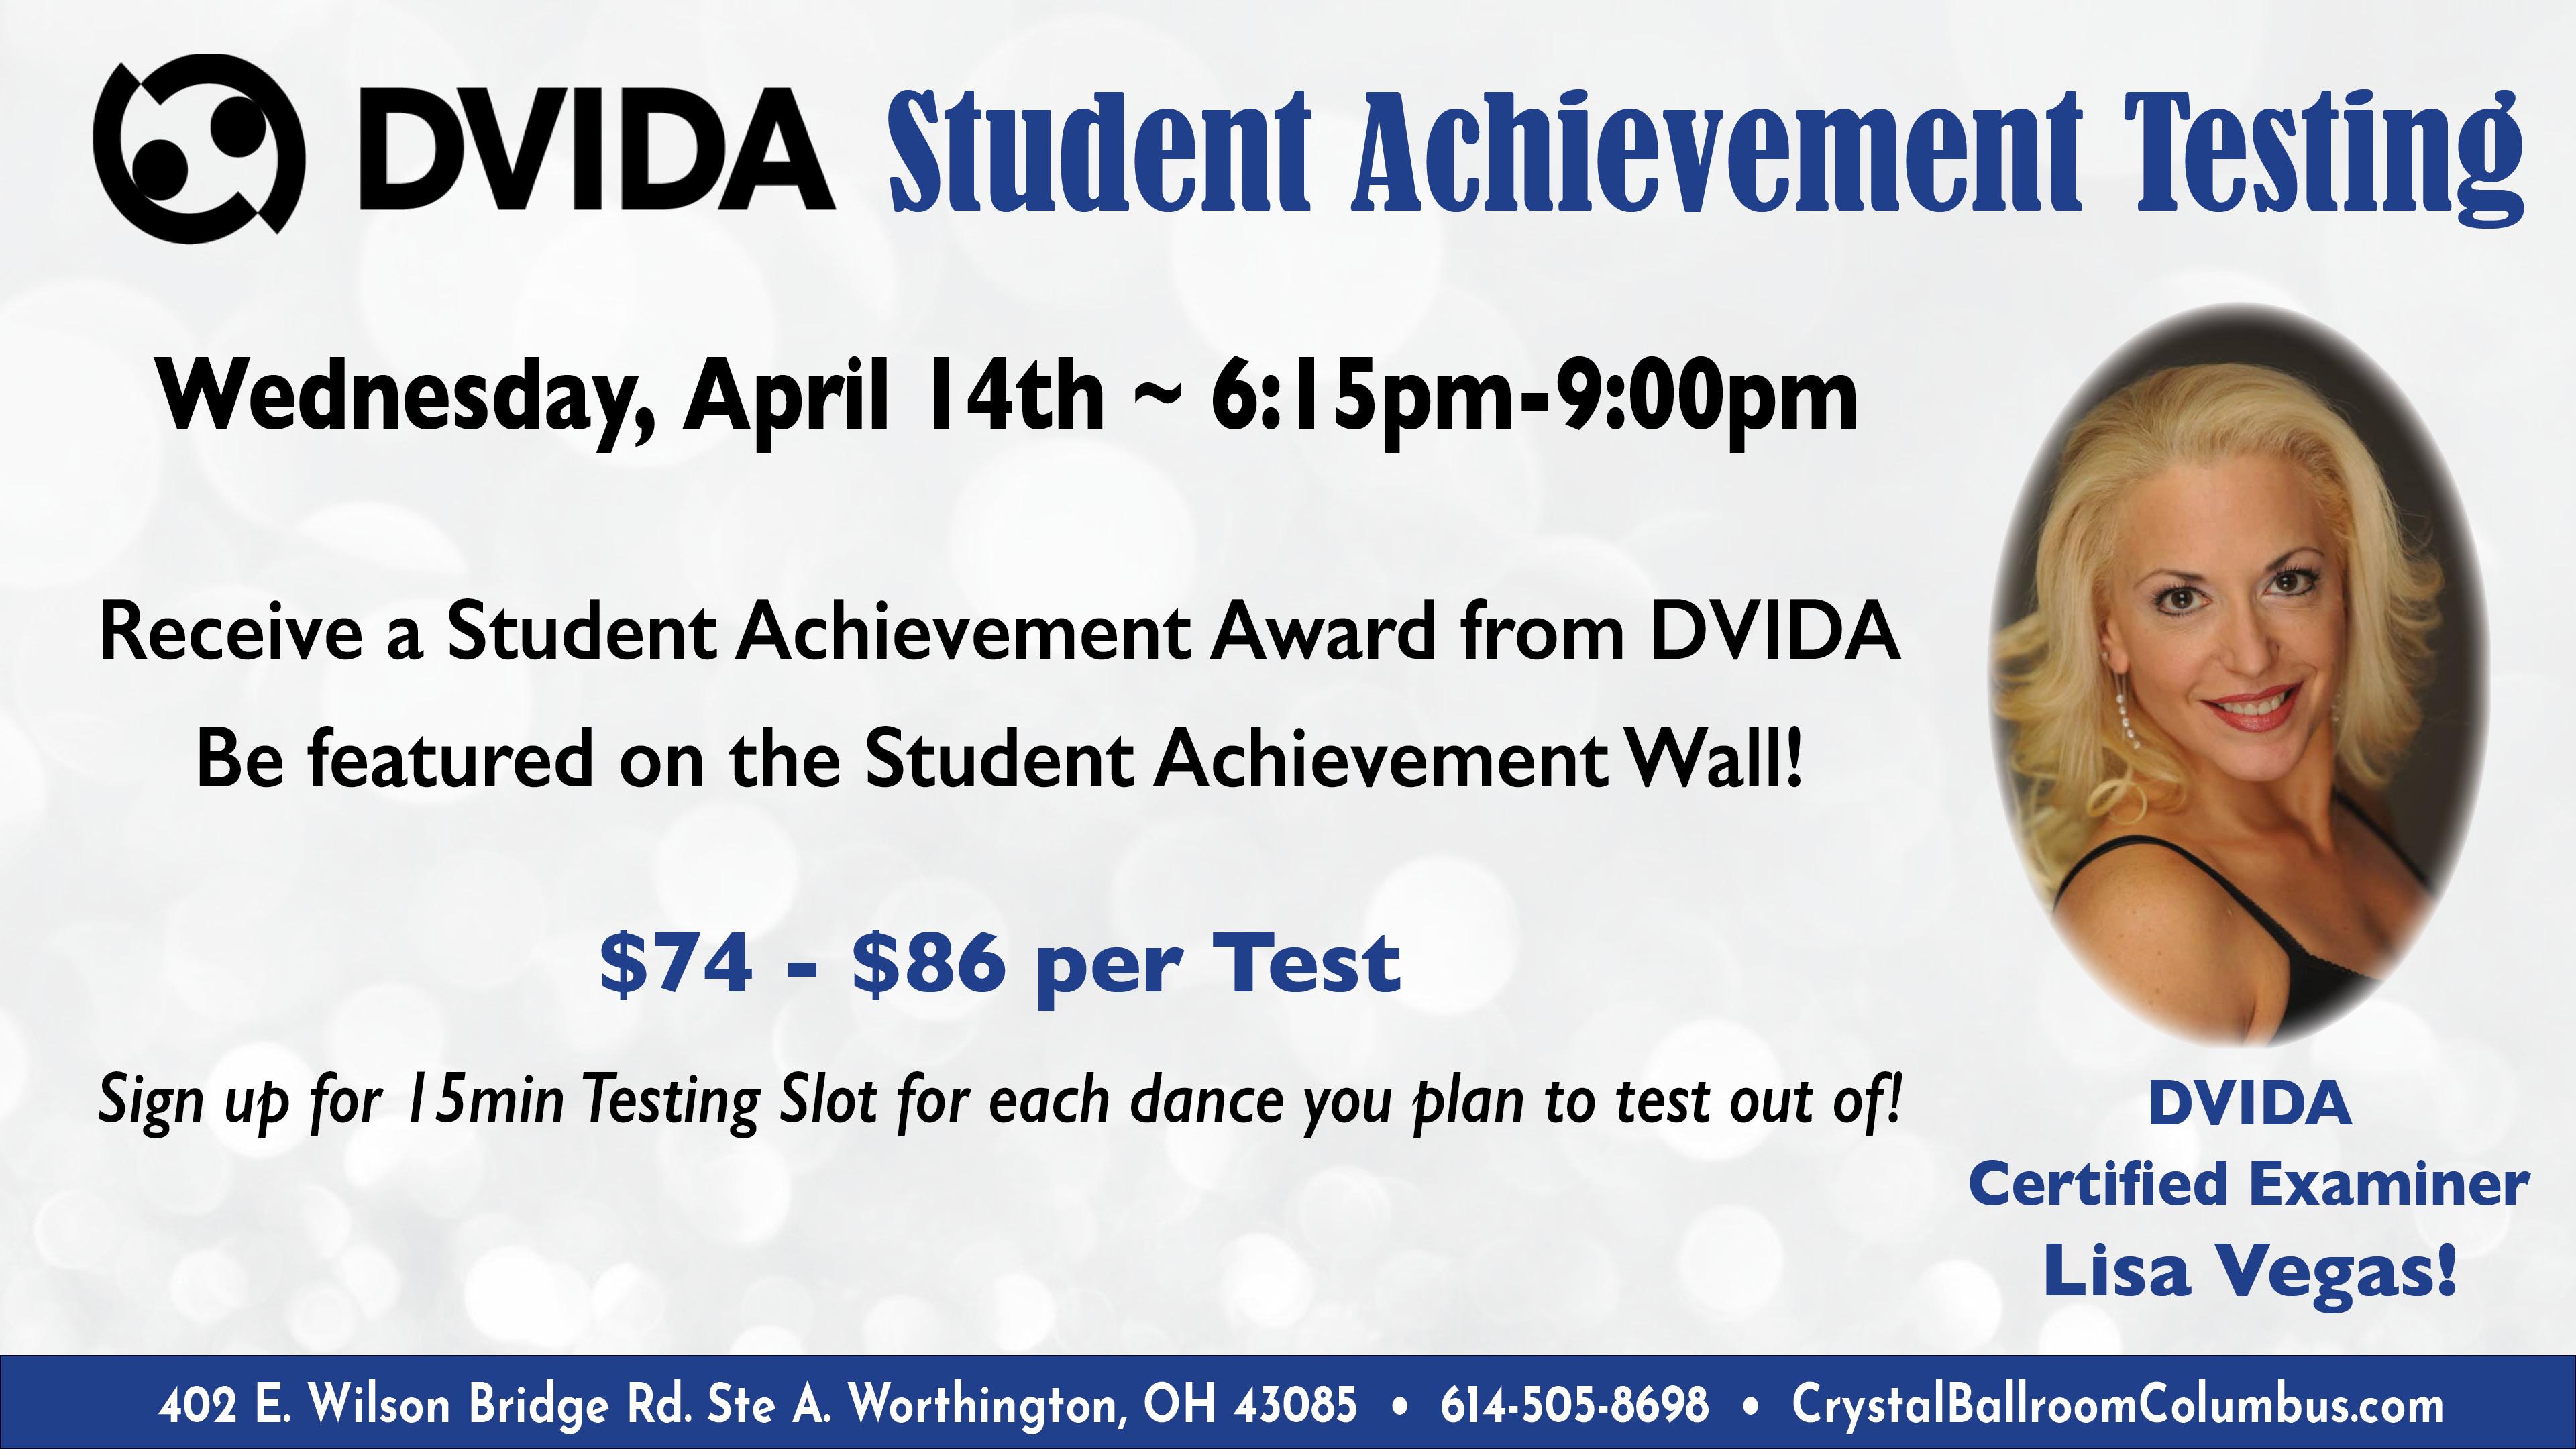 DVIDA Student Achievement Testing